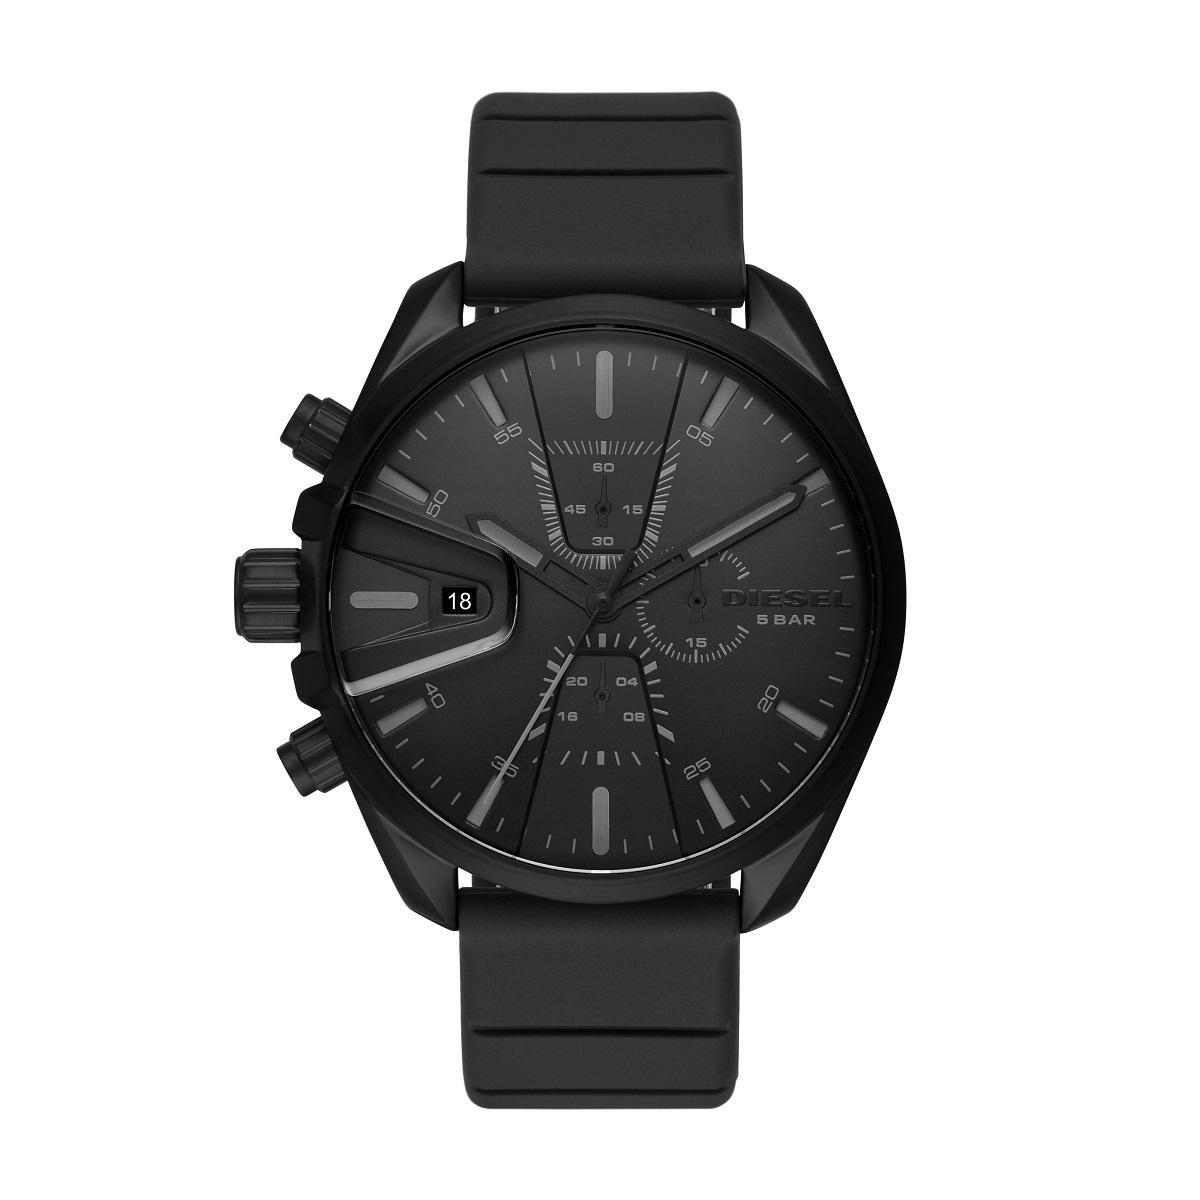 Relógio Masculino Diesel DZ4507/8PN 47mm Silicone Preto